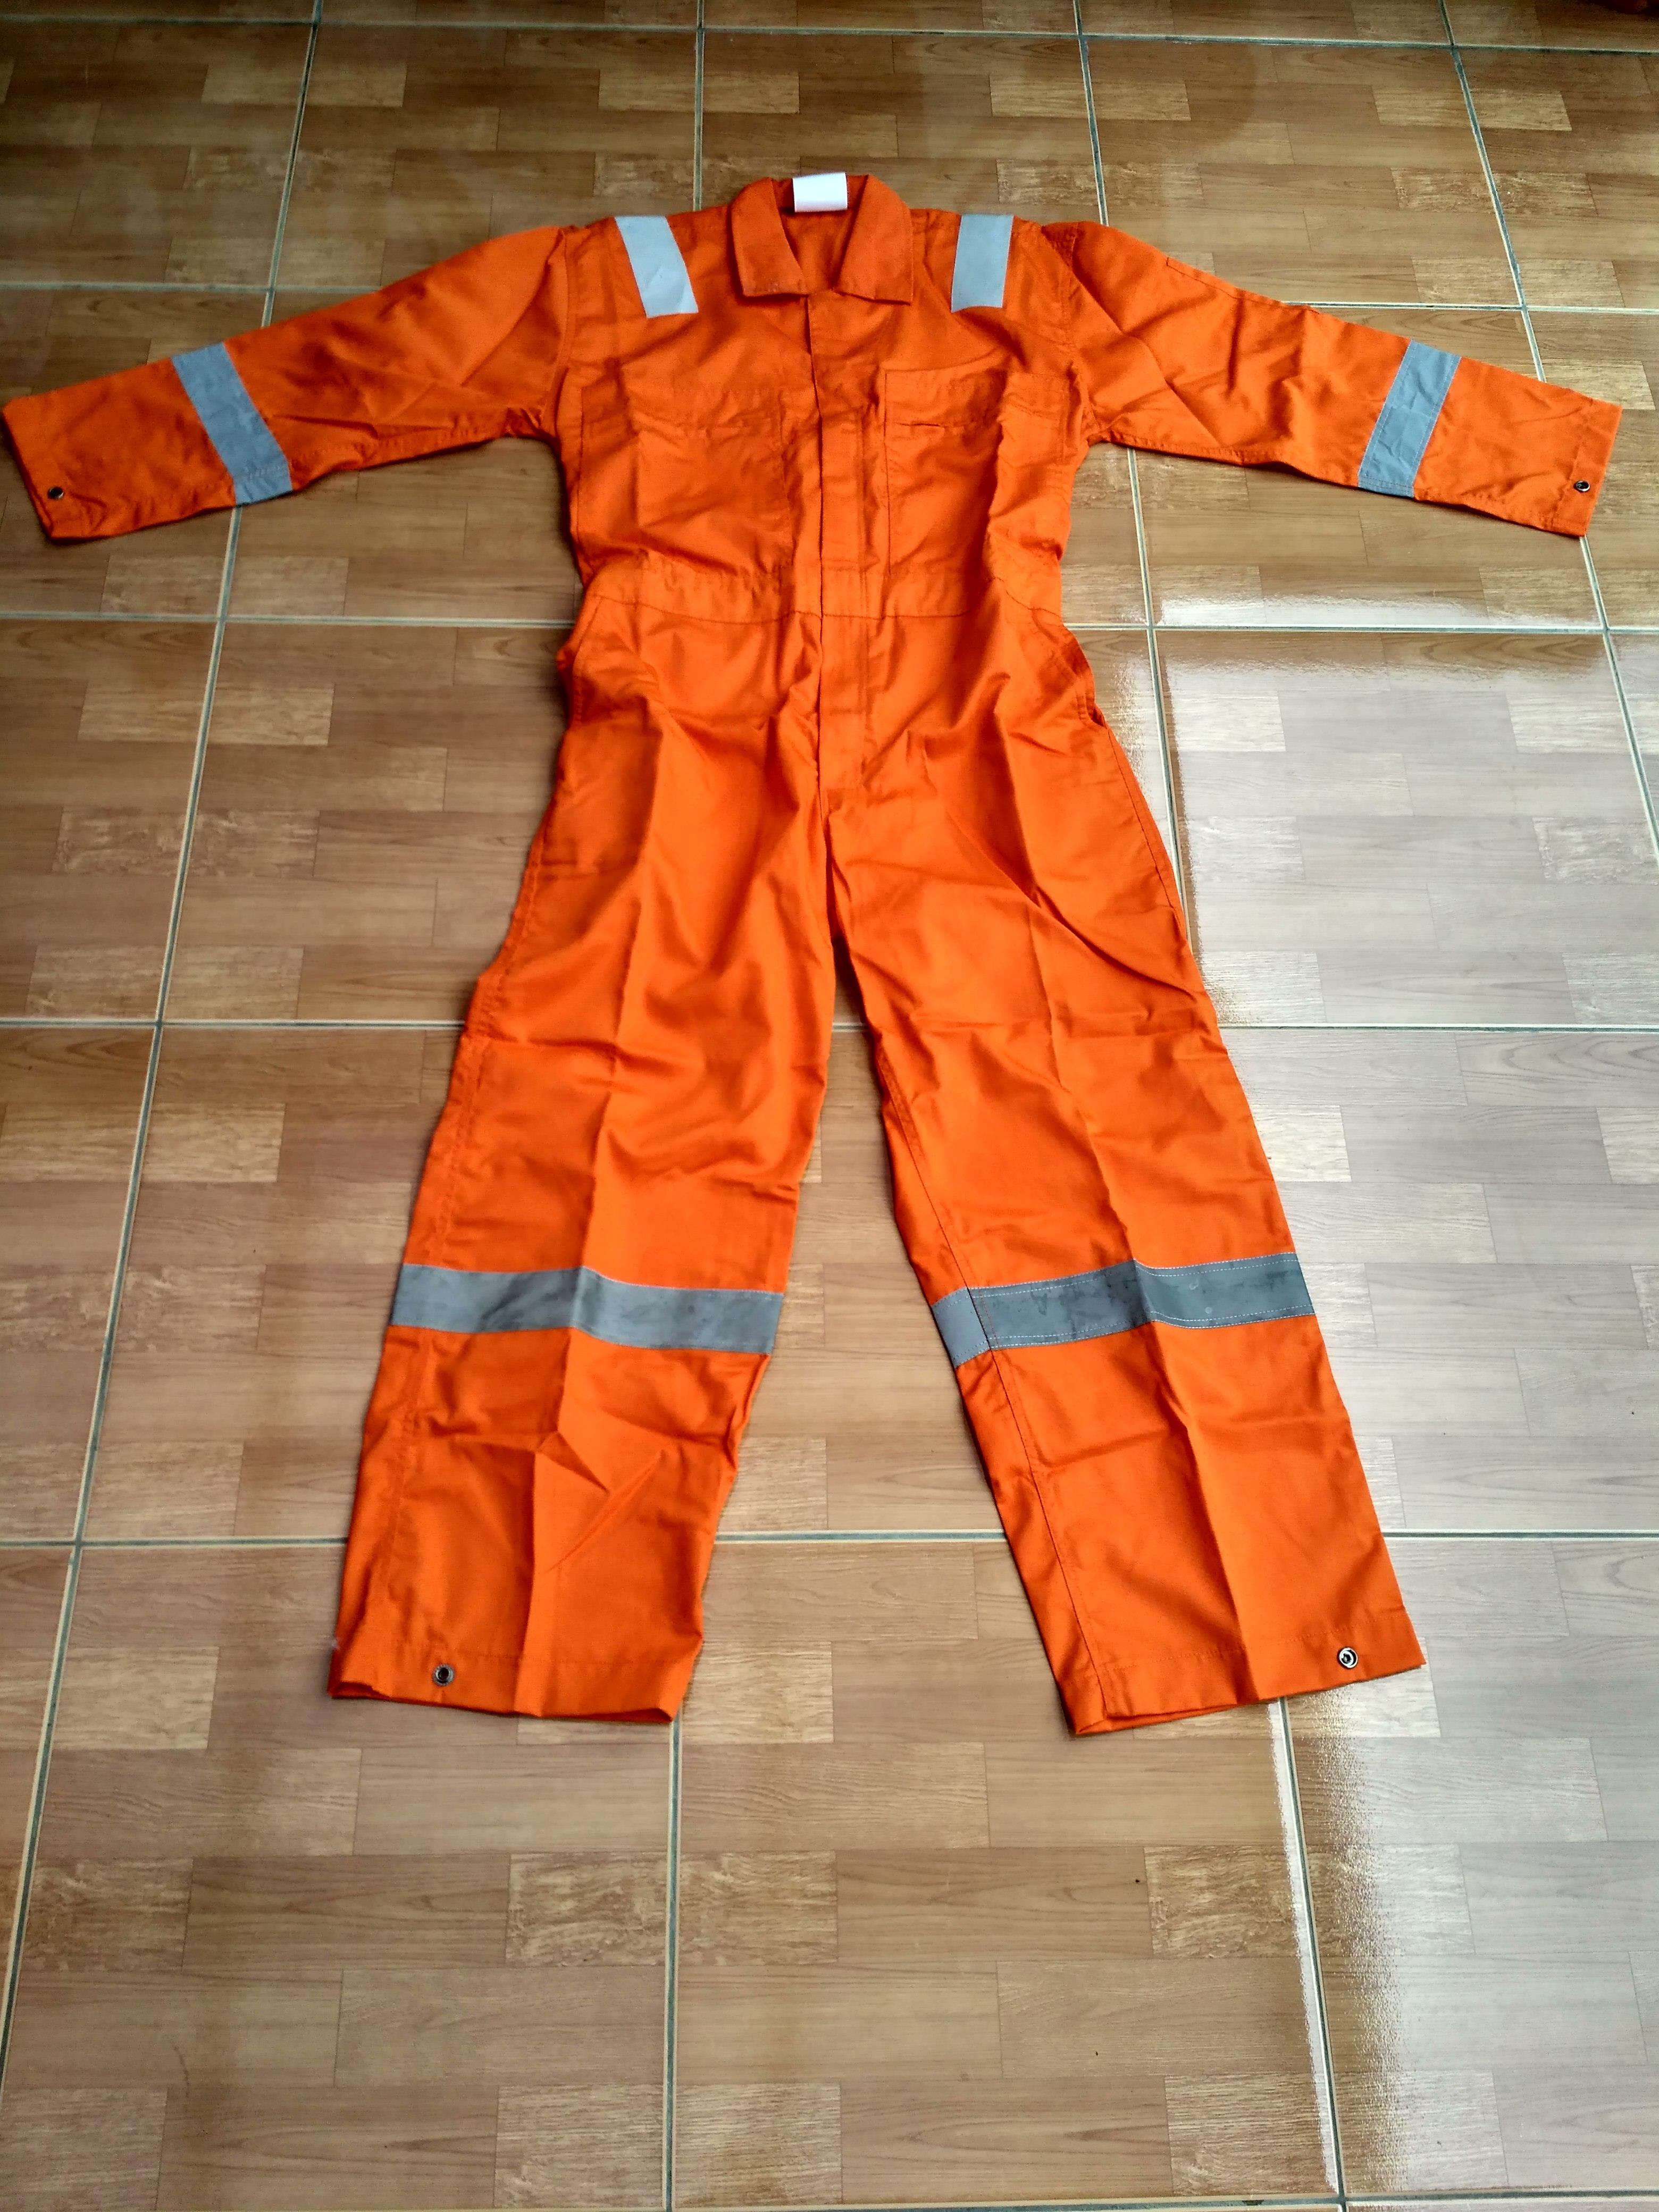 Wearpack By Denim Safety Werpak Wearpak Setelan Baju Celana 3triocollection